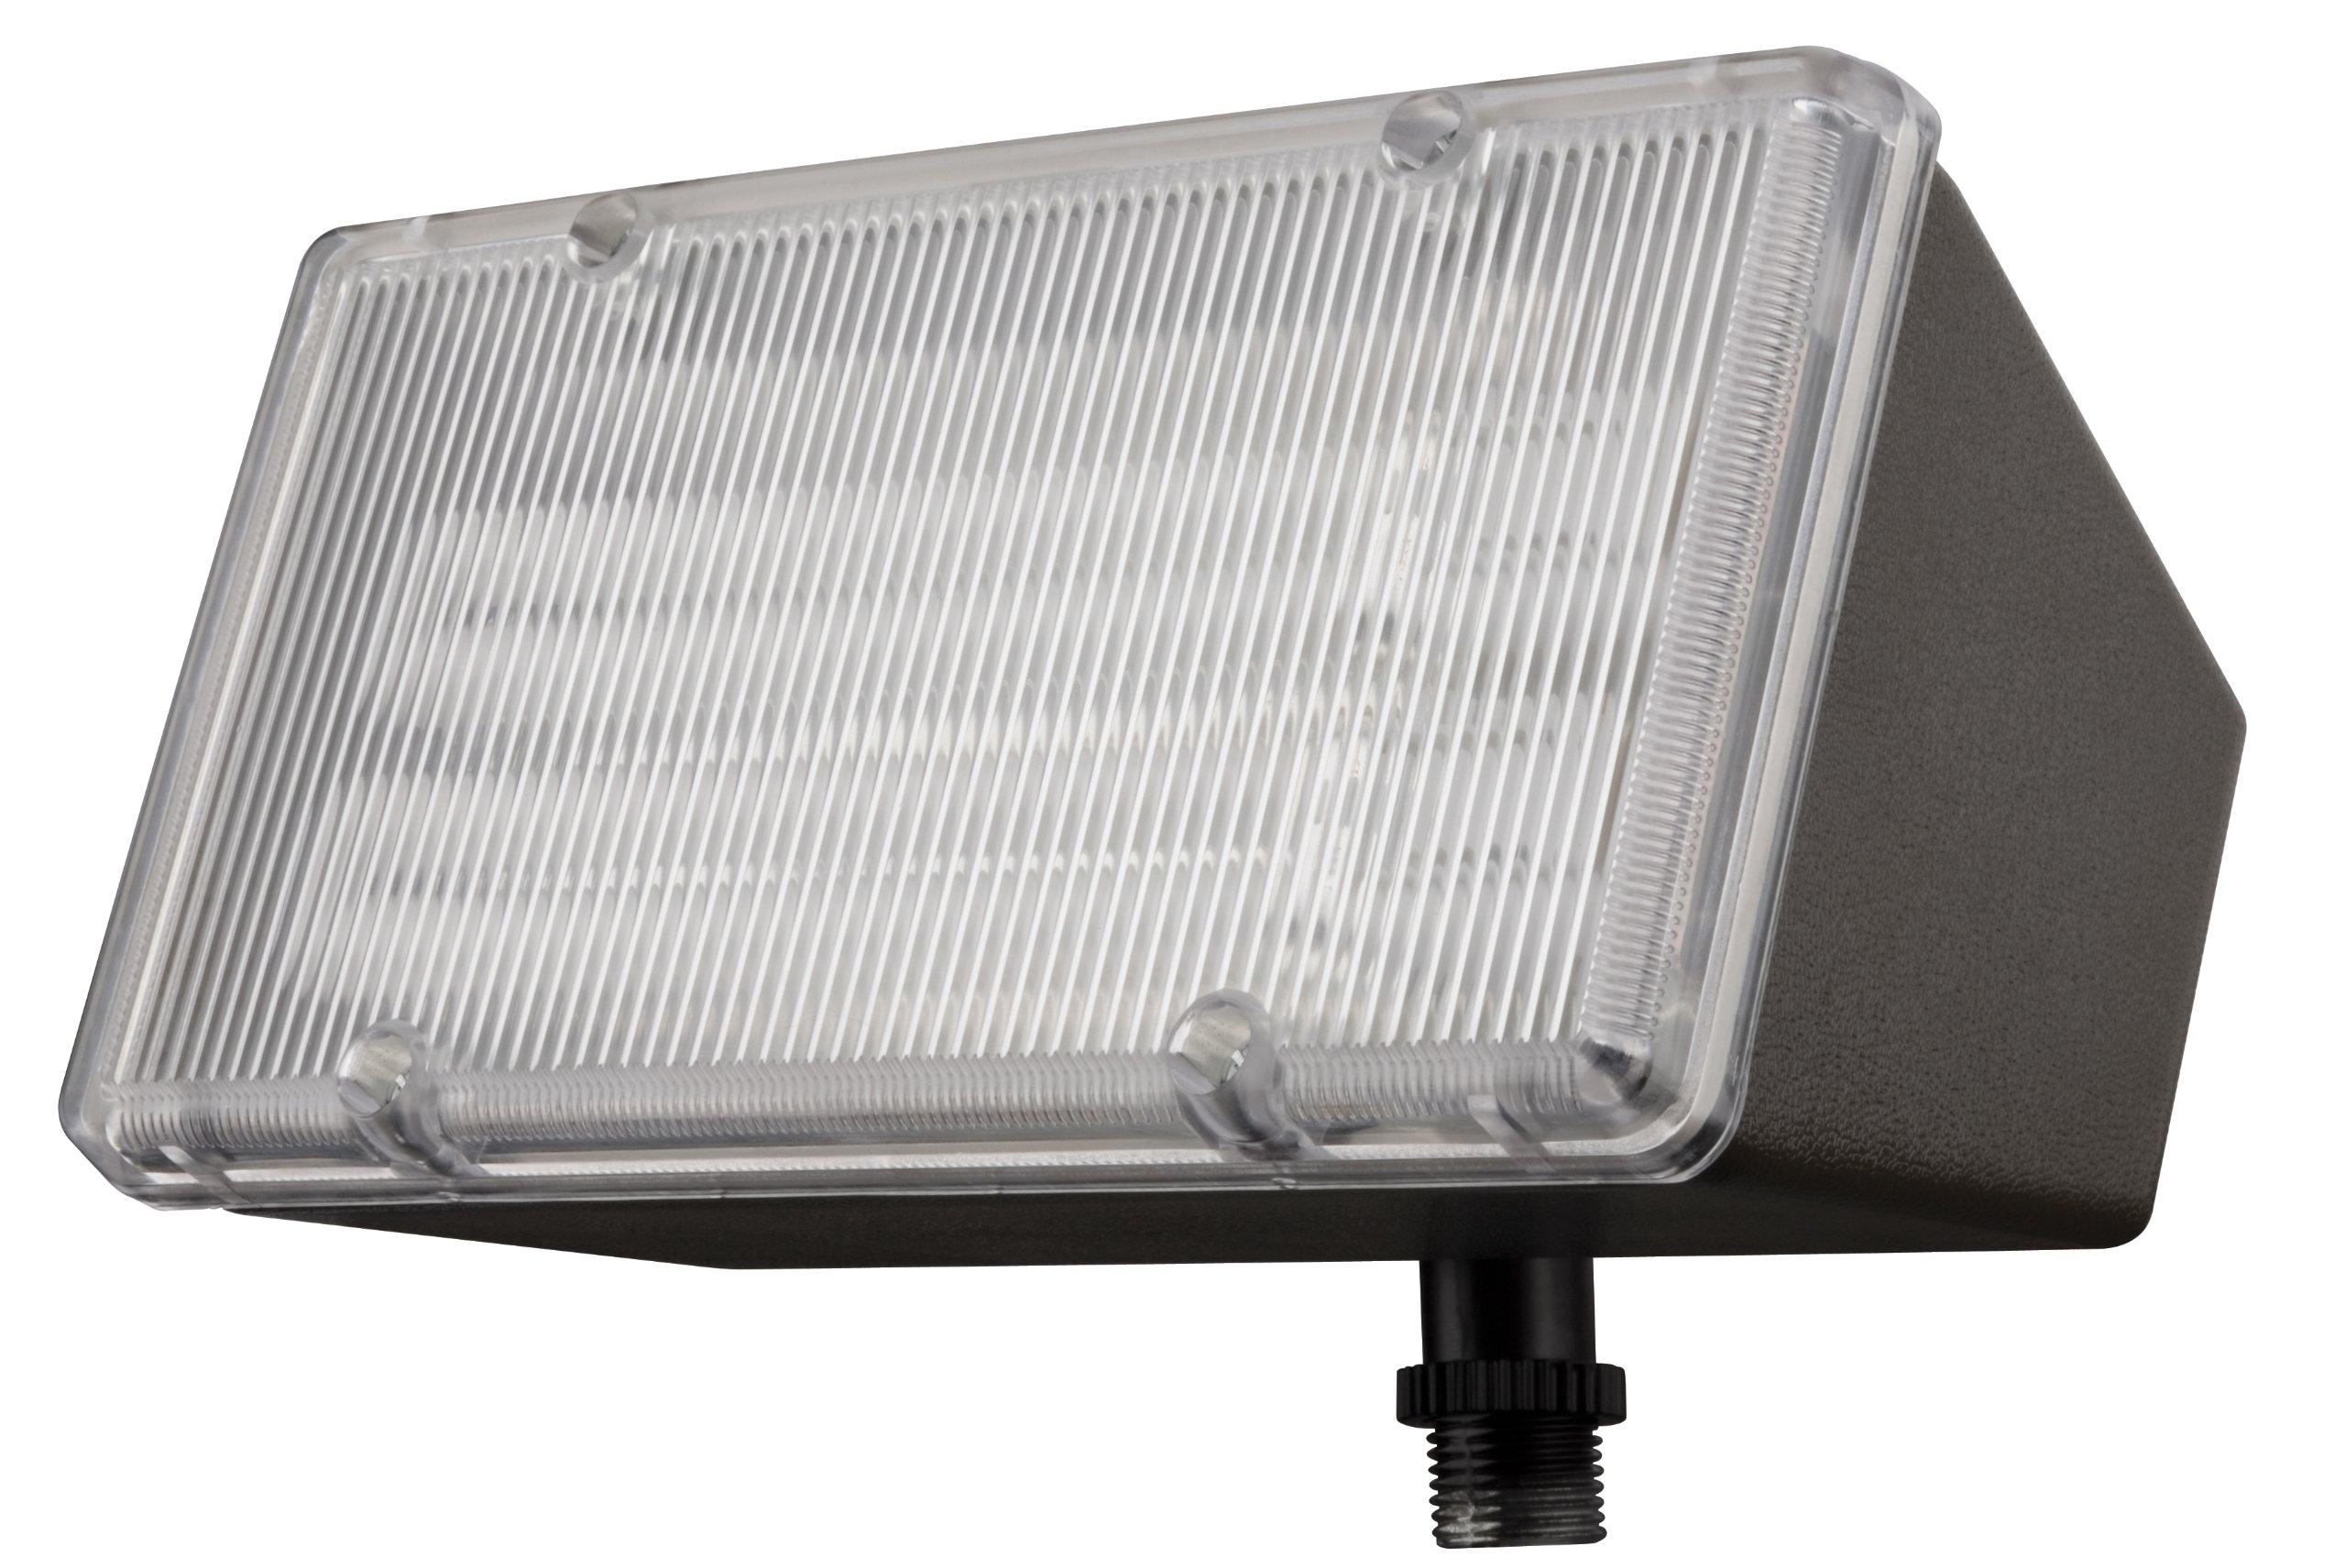 Lithonia Lighting OFL 213F 120 LP BZ M4 Mini-Flood Light with Two 13-Watt 2700K Compact Quad-Tube Fluorscent Lamps, Black Bronze